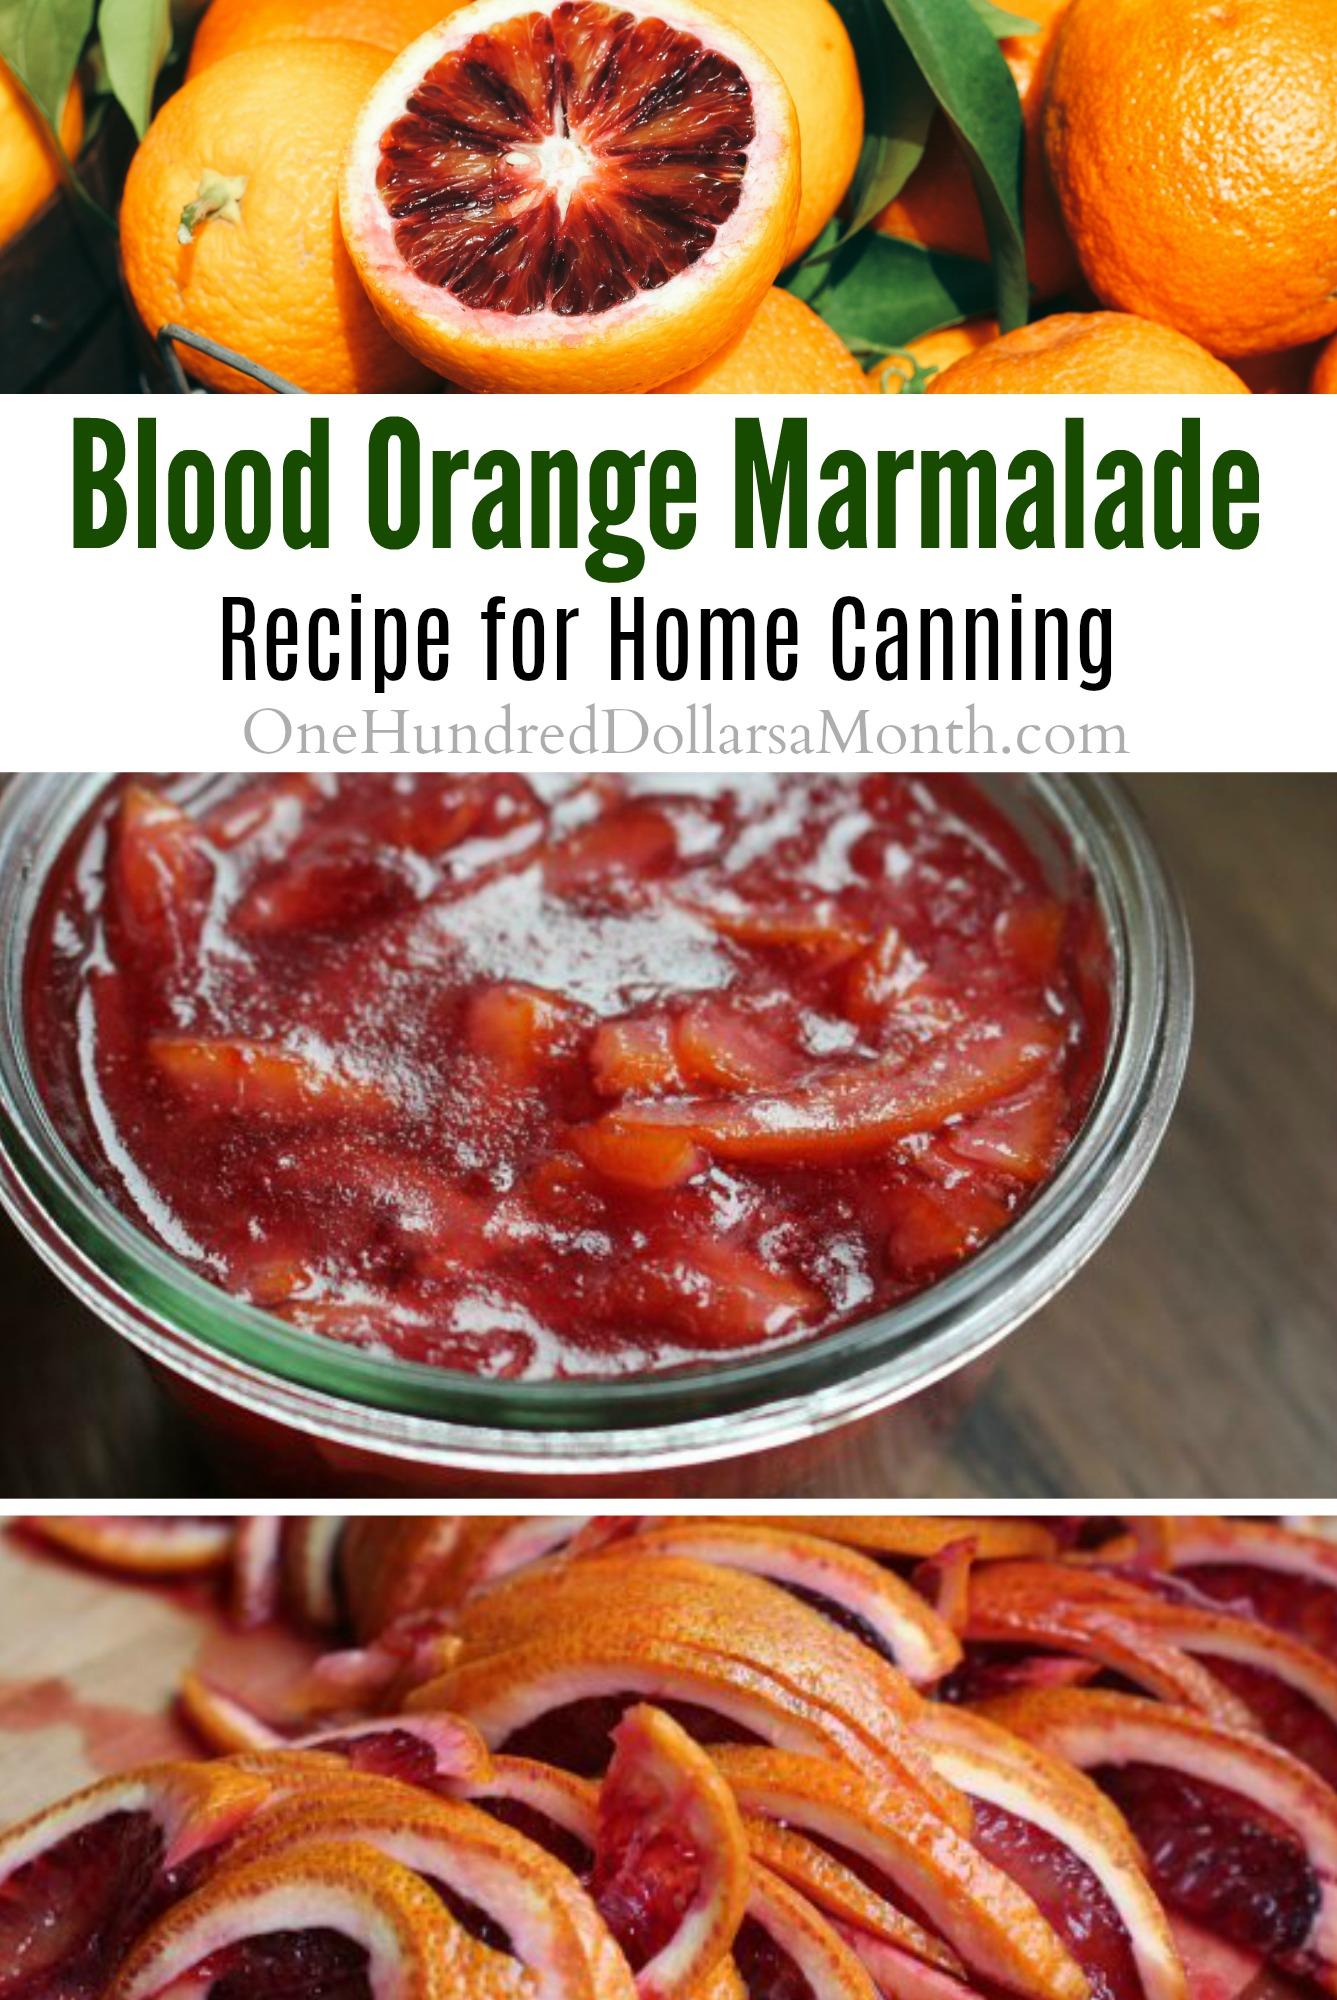 Blood Orange Marmalade - One Hundred Dollars a Month